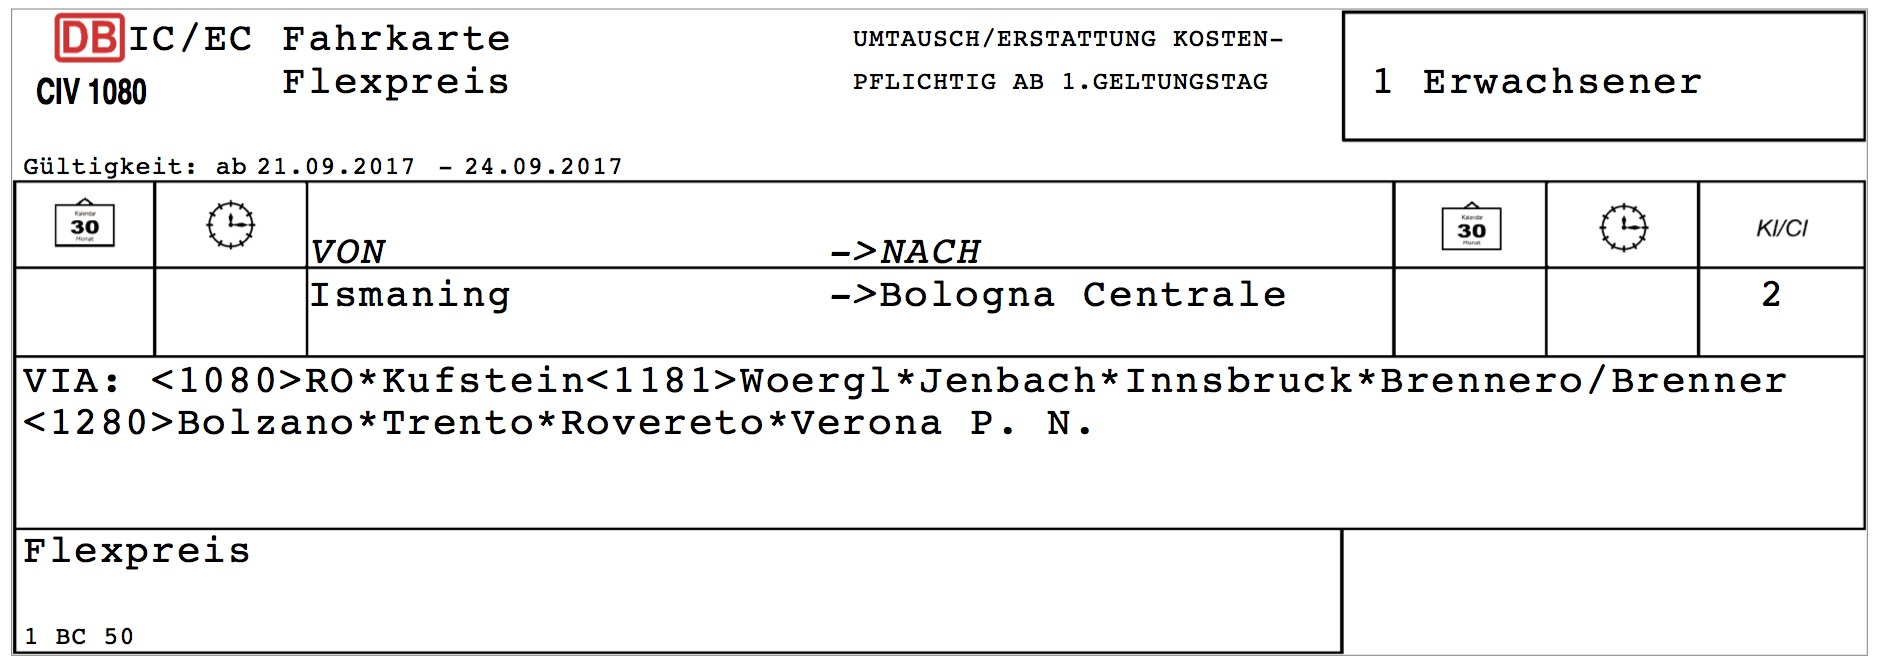 Ticket München Italien